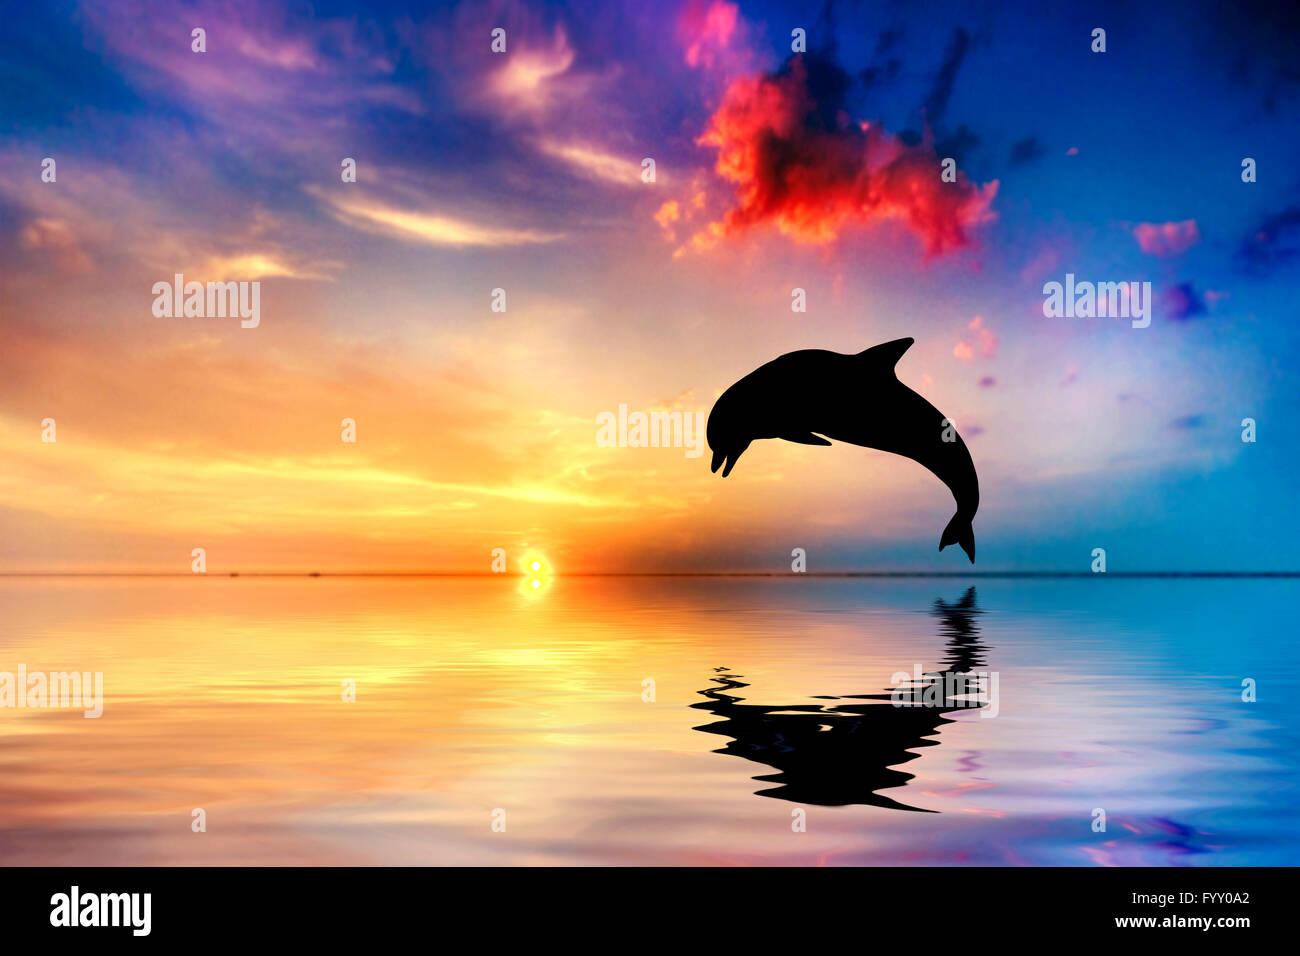 dolphin tail stockfotos dolphin tail bilder alamy. Black Bedroom Furniture Sets. Home Design Ideas